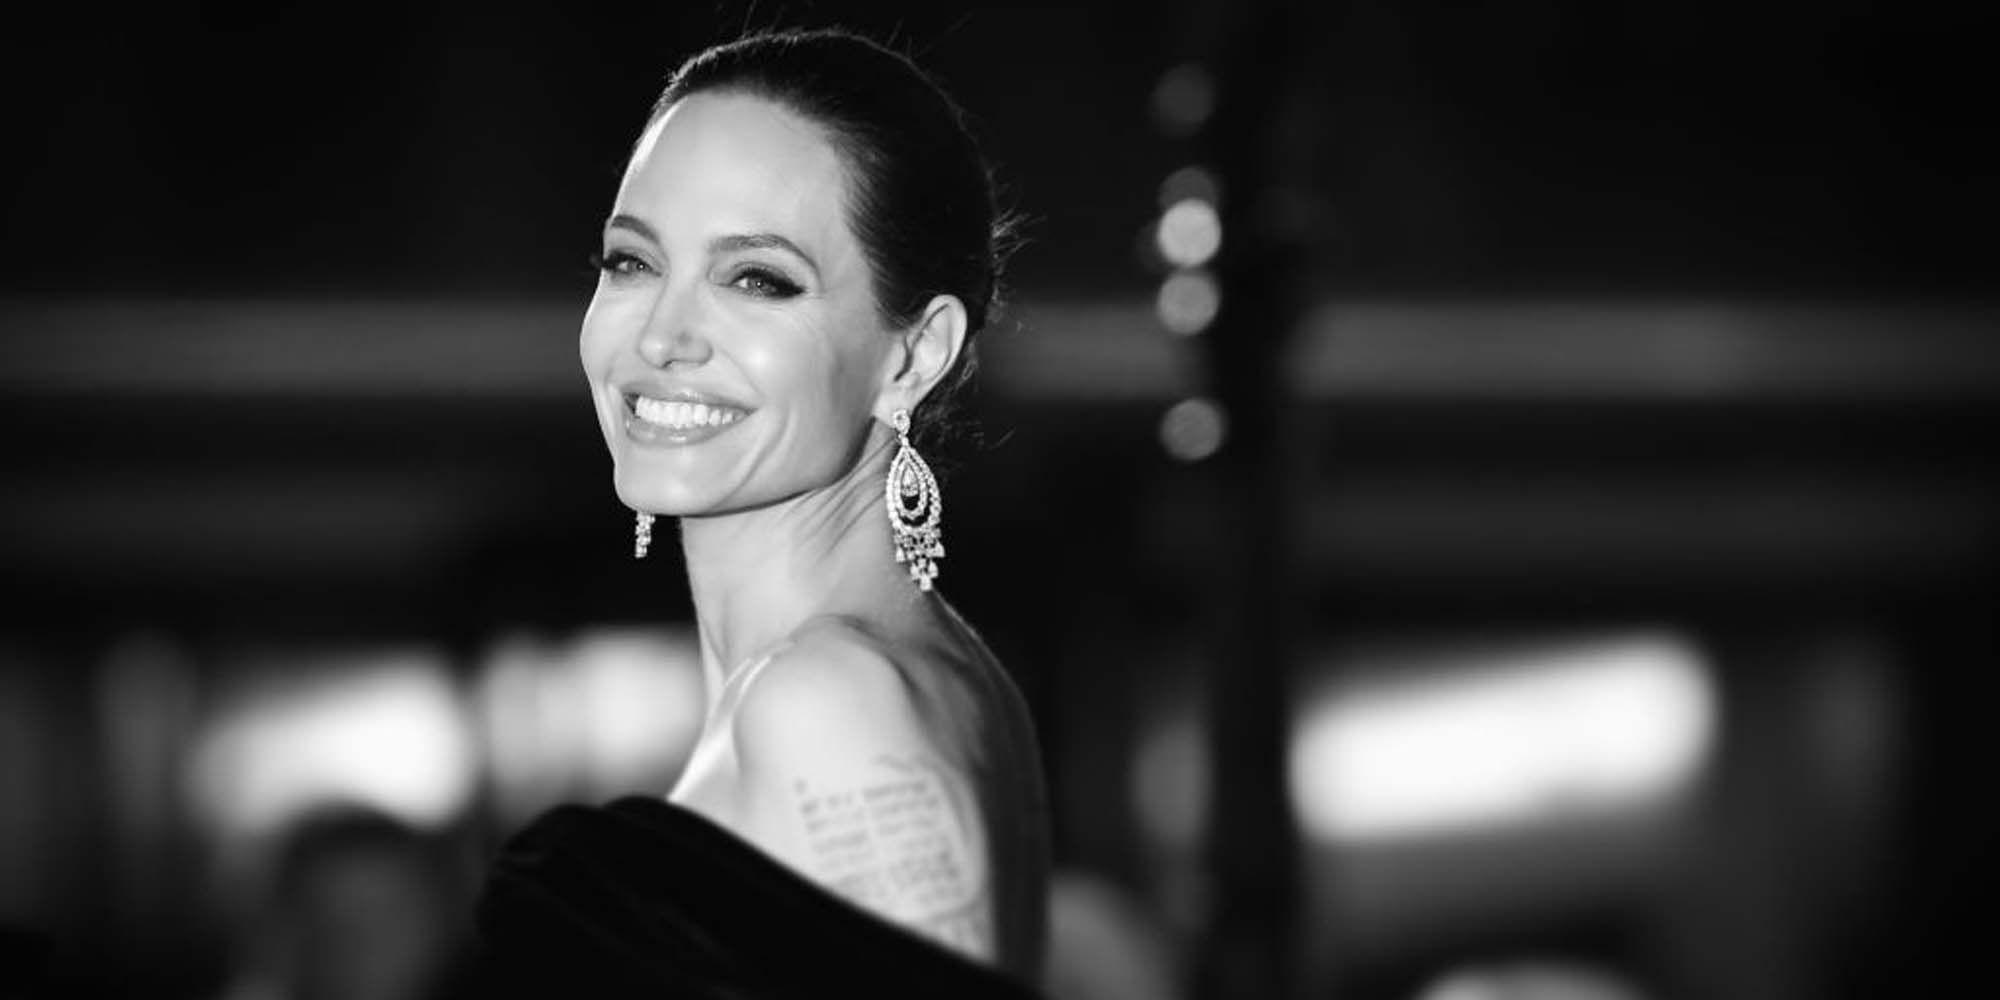 Angelina Jolie, bbc, radioshow, Kerst, presentatie, presentator